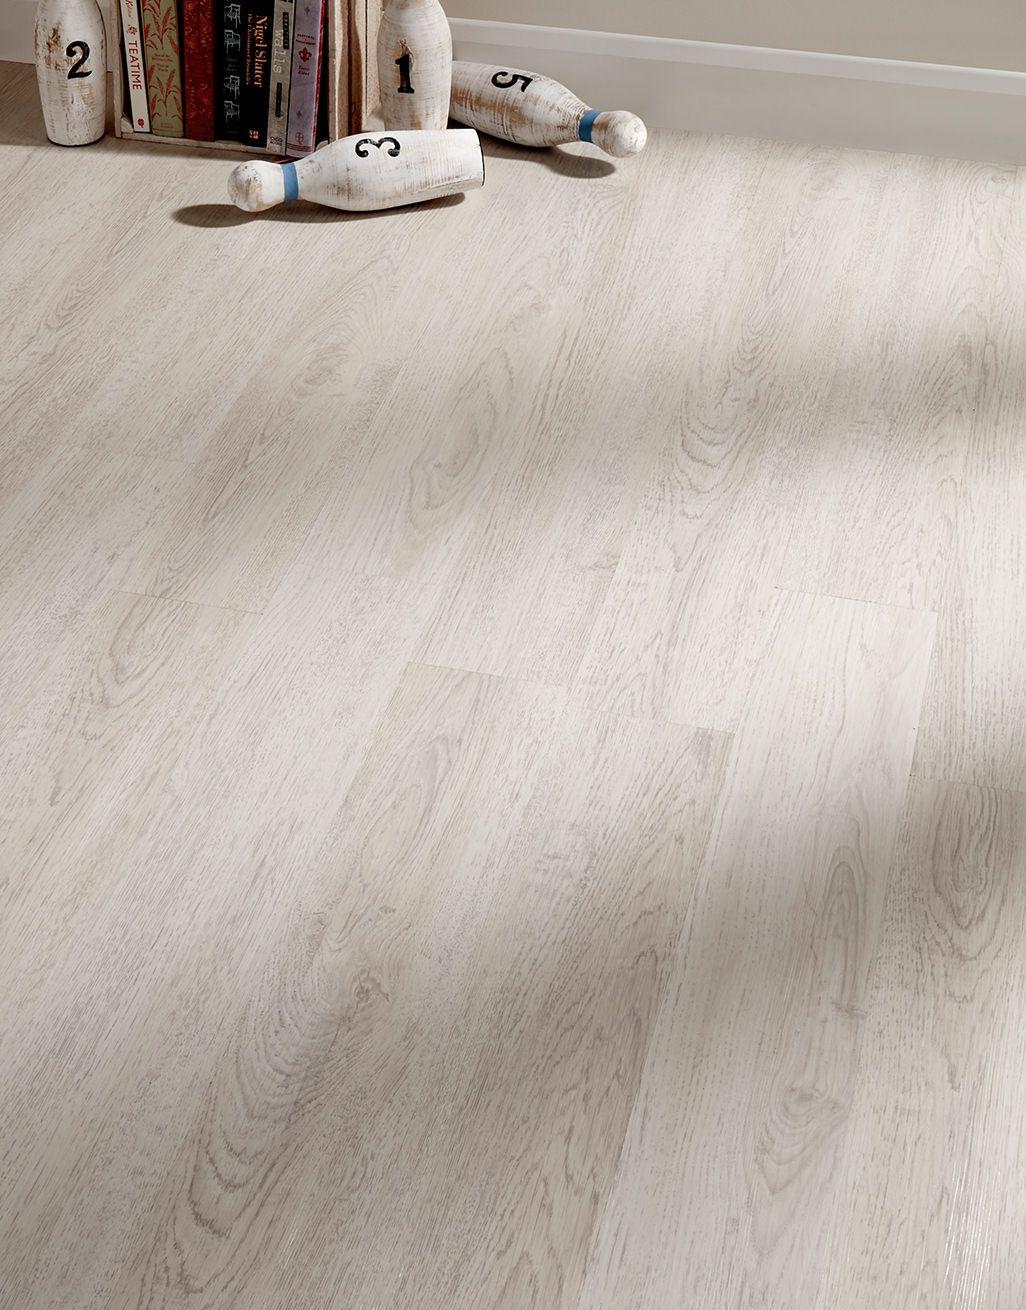 Venice Click Whitewashed Oak Lvt Flooring Lvt Flooring White Wash Wood Floors White Wash Oak Floor